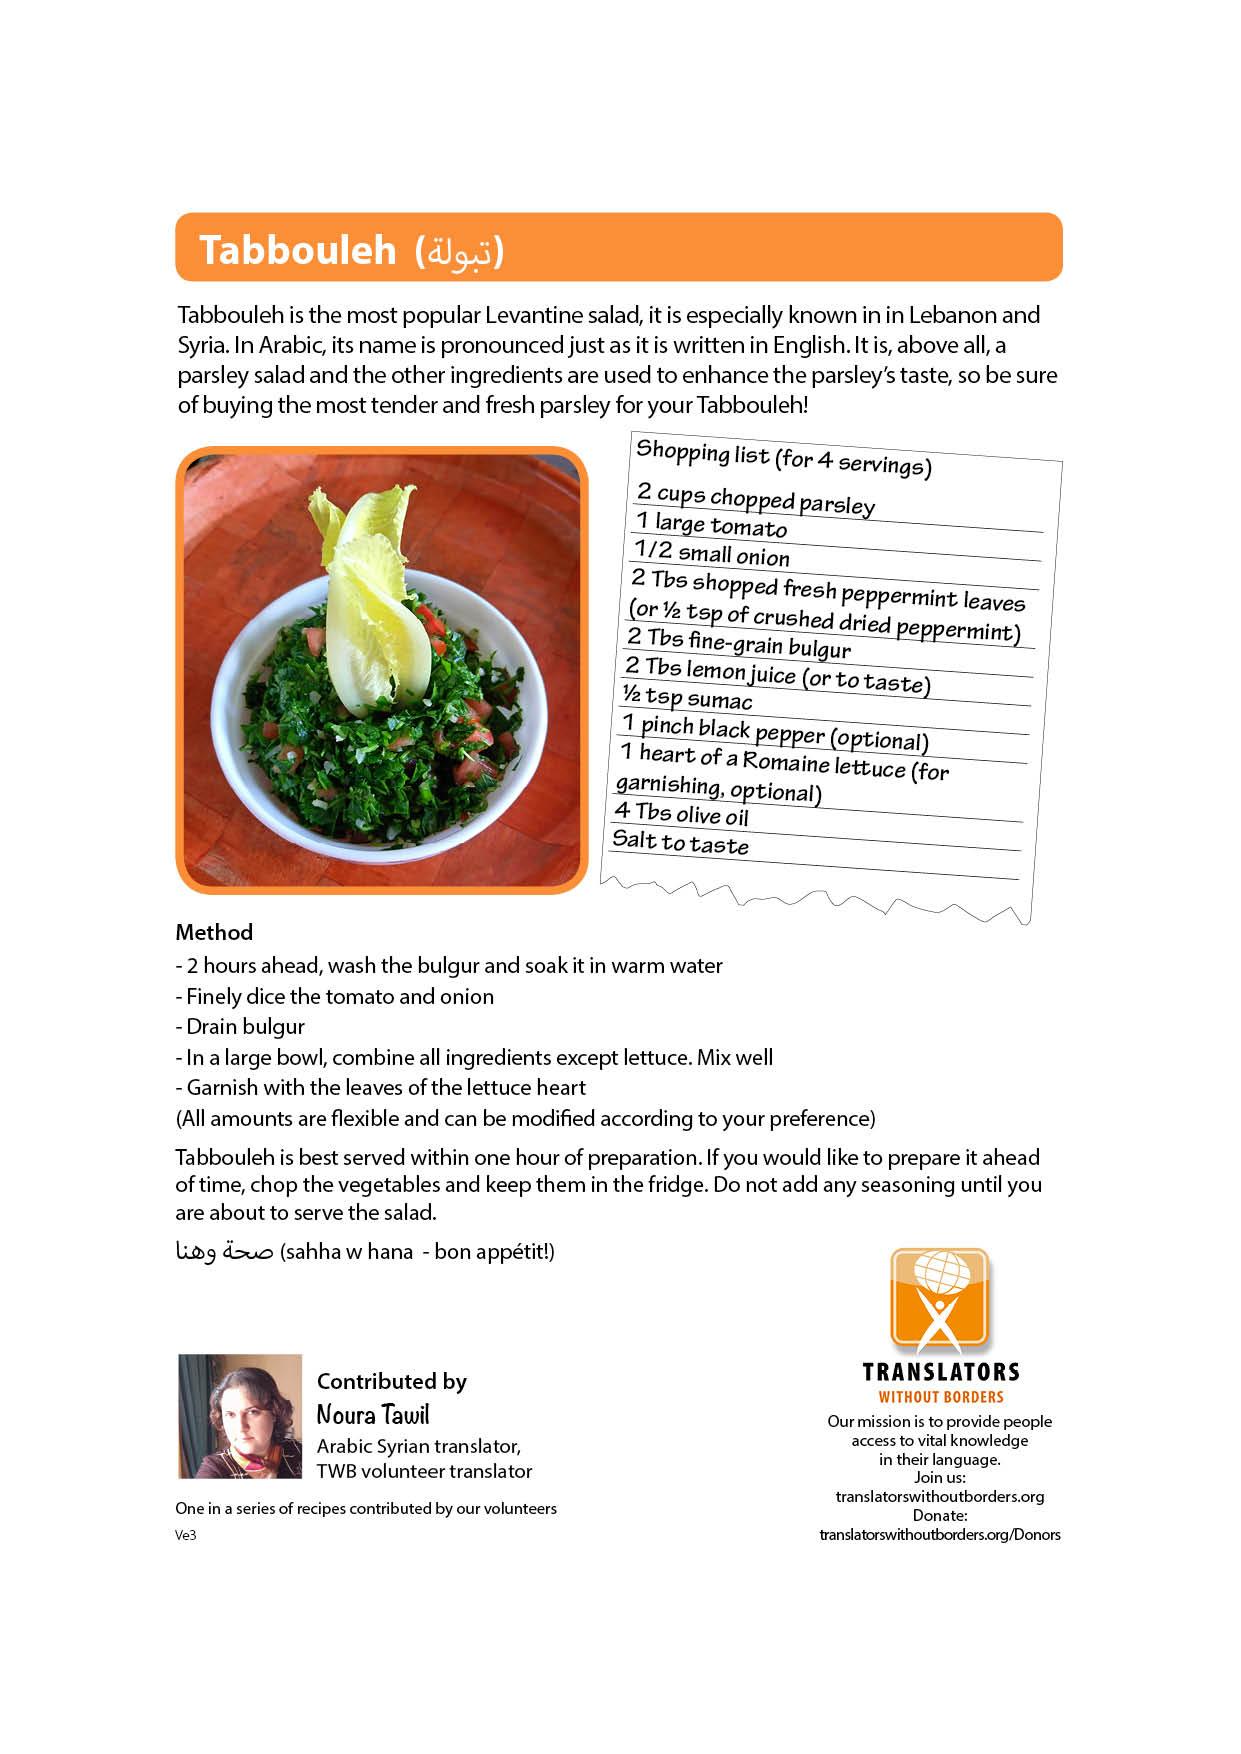 Tabbouleh translators without borders cookbook download pdf forumfinder Choice Image